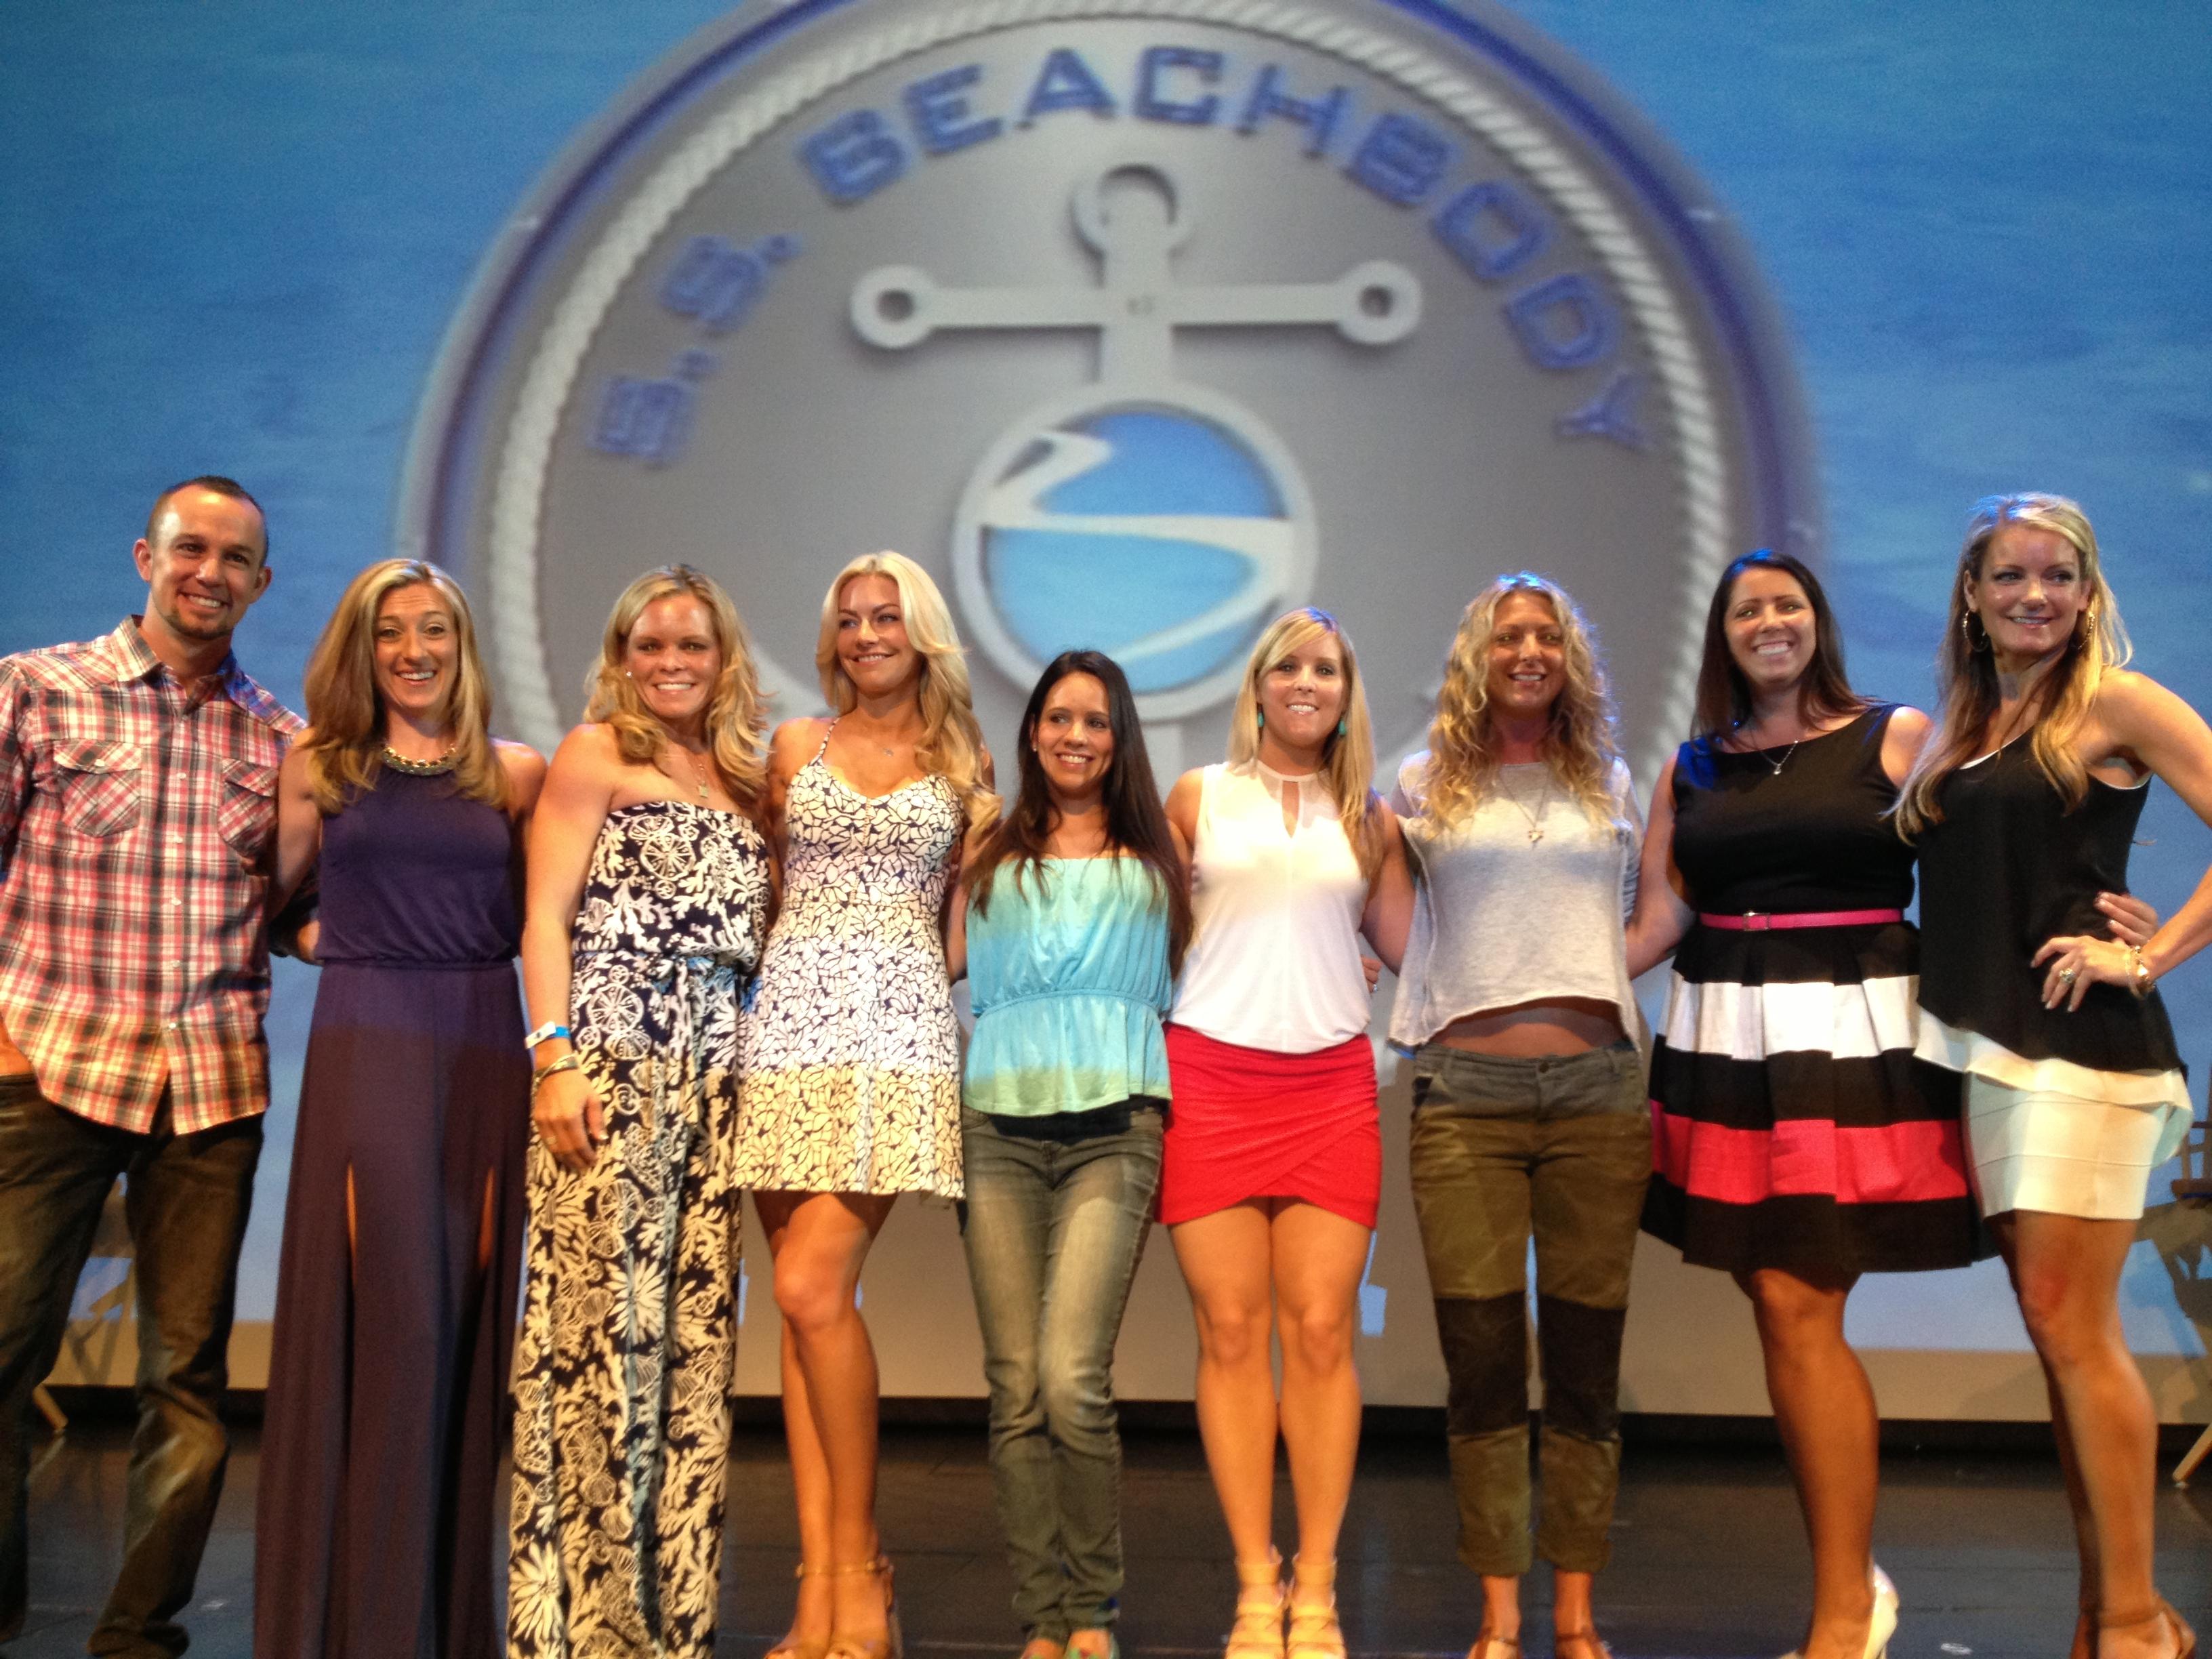 Top Beachbody Coach Struggle